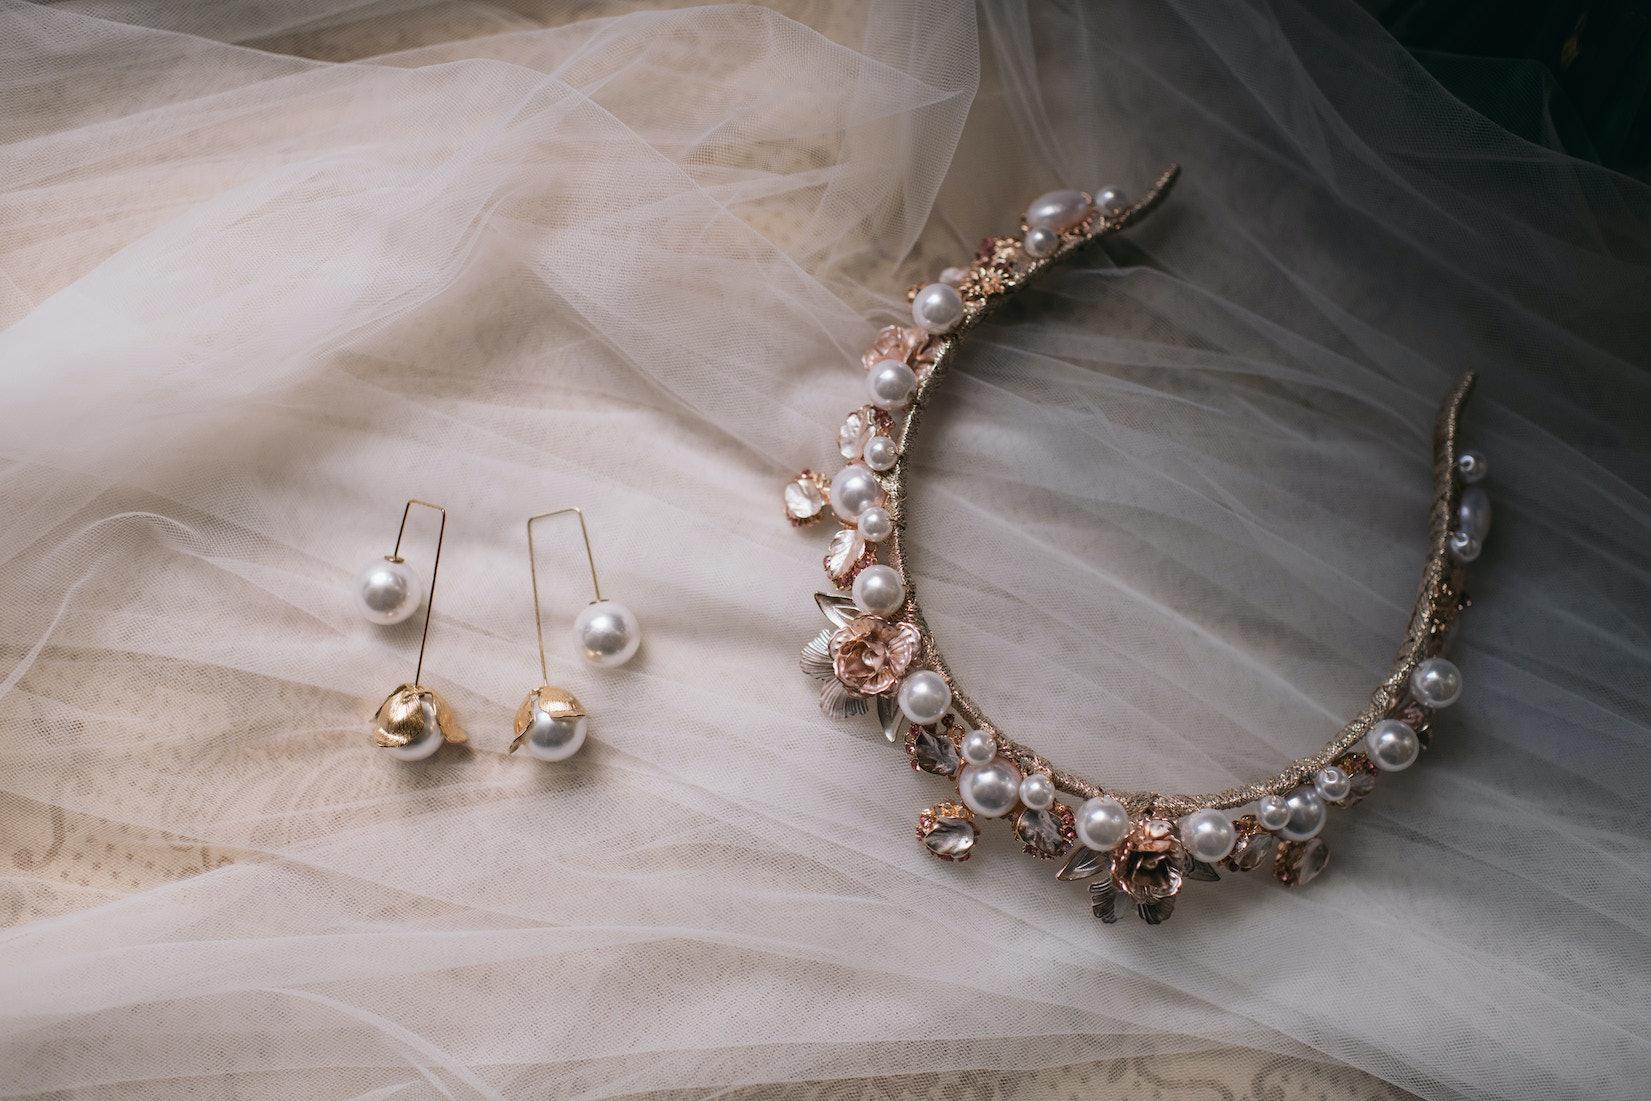 Bridal earrings and tiara